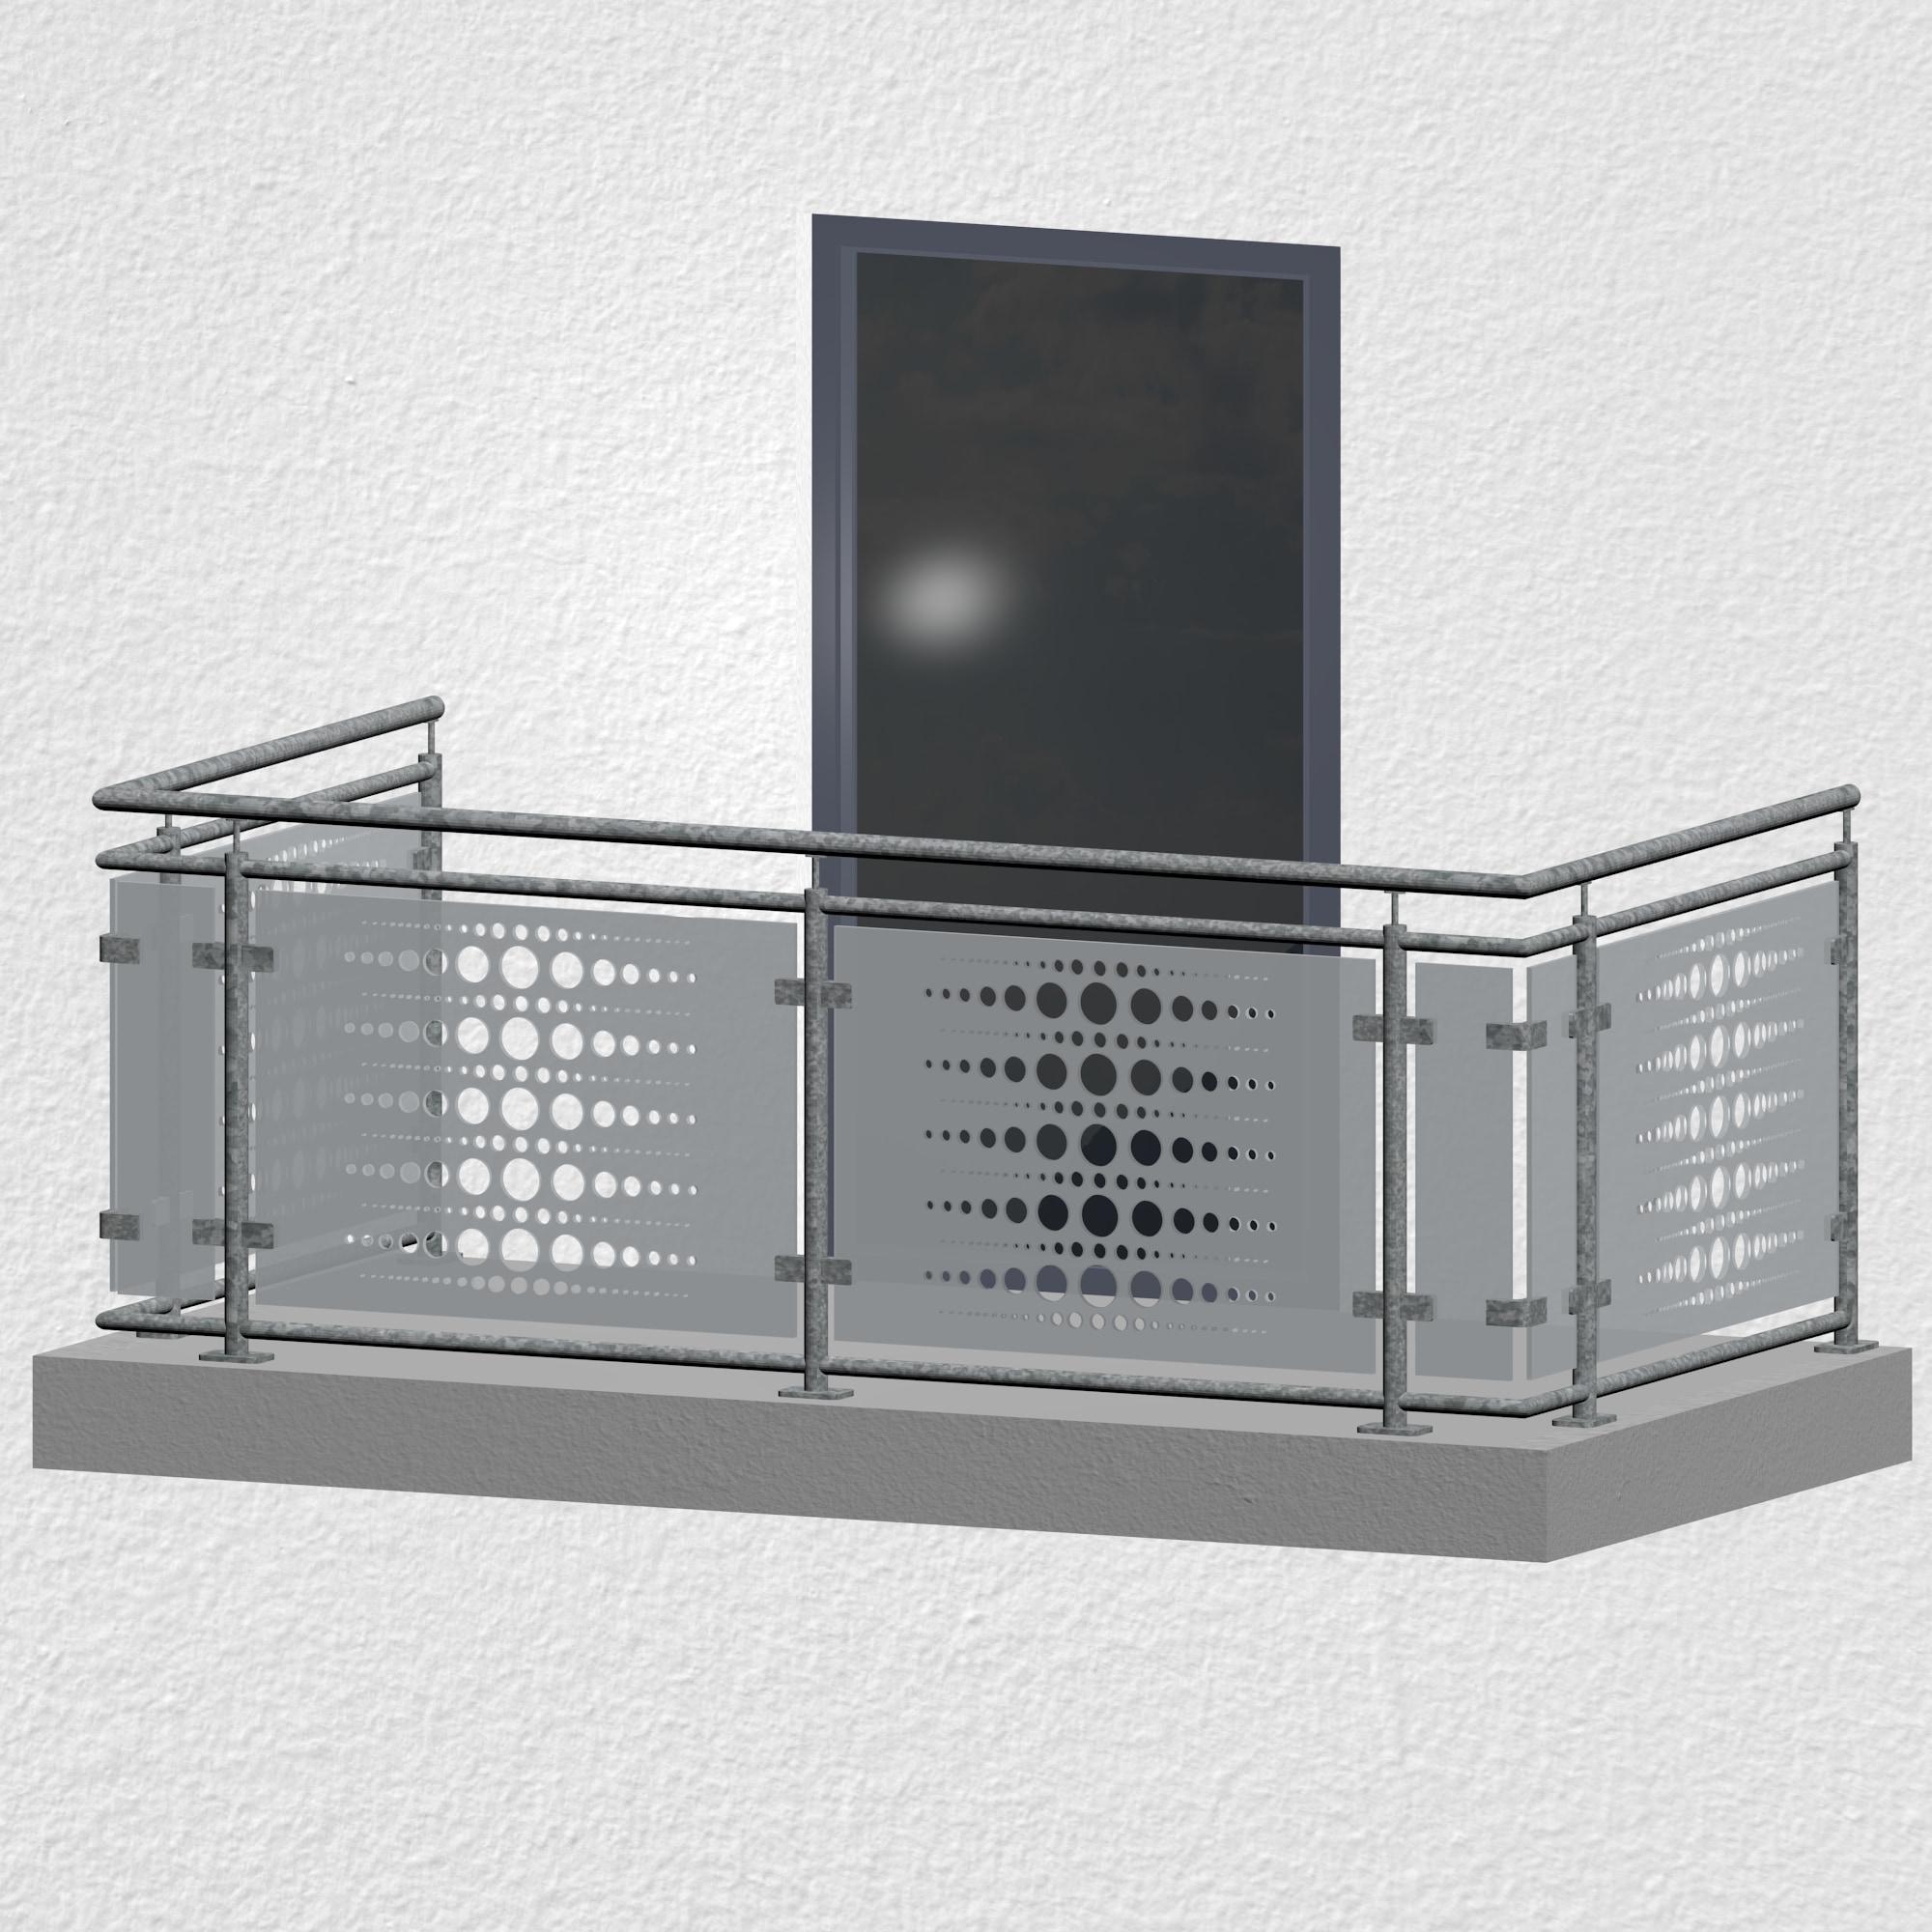 Balkongeländer verzinkt Designglas PE 2